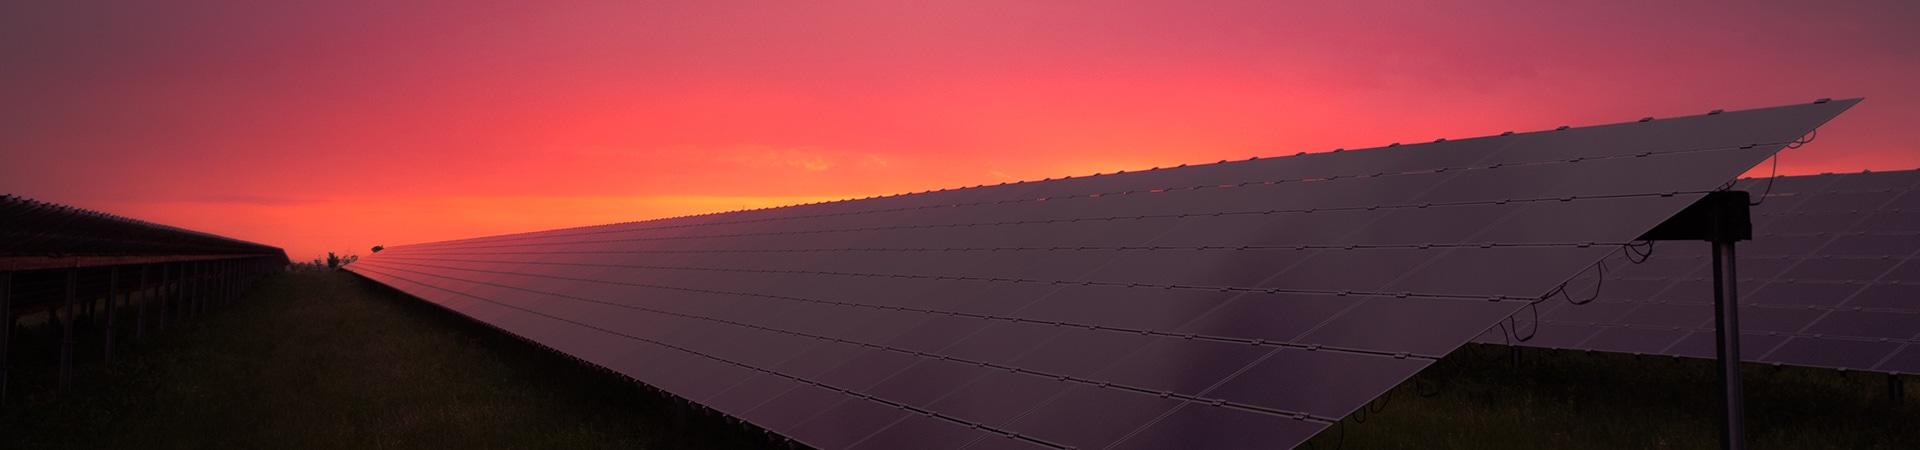 Starsol-Paneles-Solares-Industria